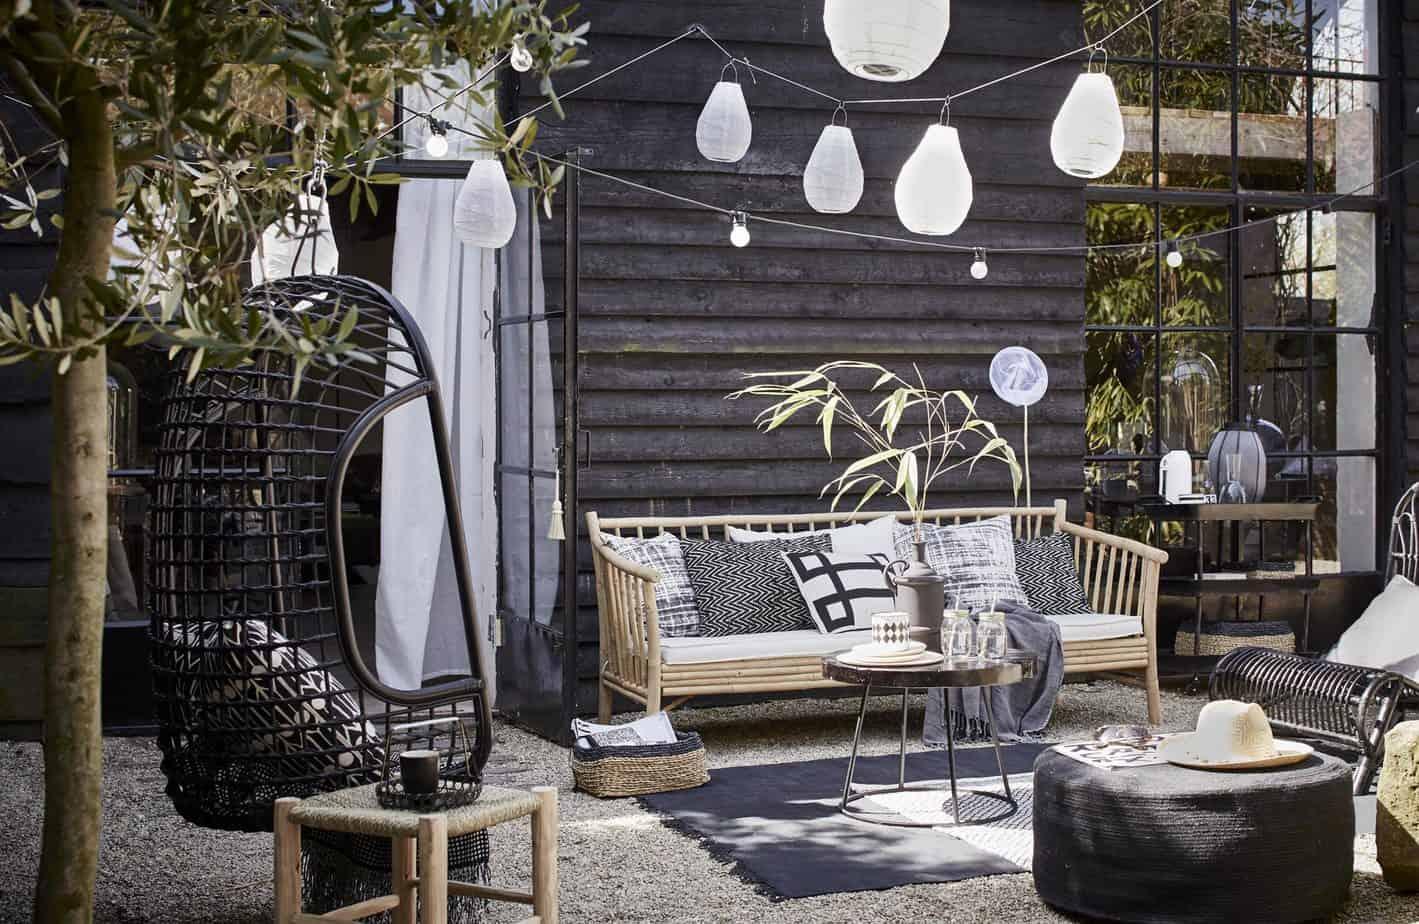 Bakstenen Muur Tuin : Zwart in de tuin? enjoy! the good life